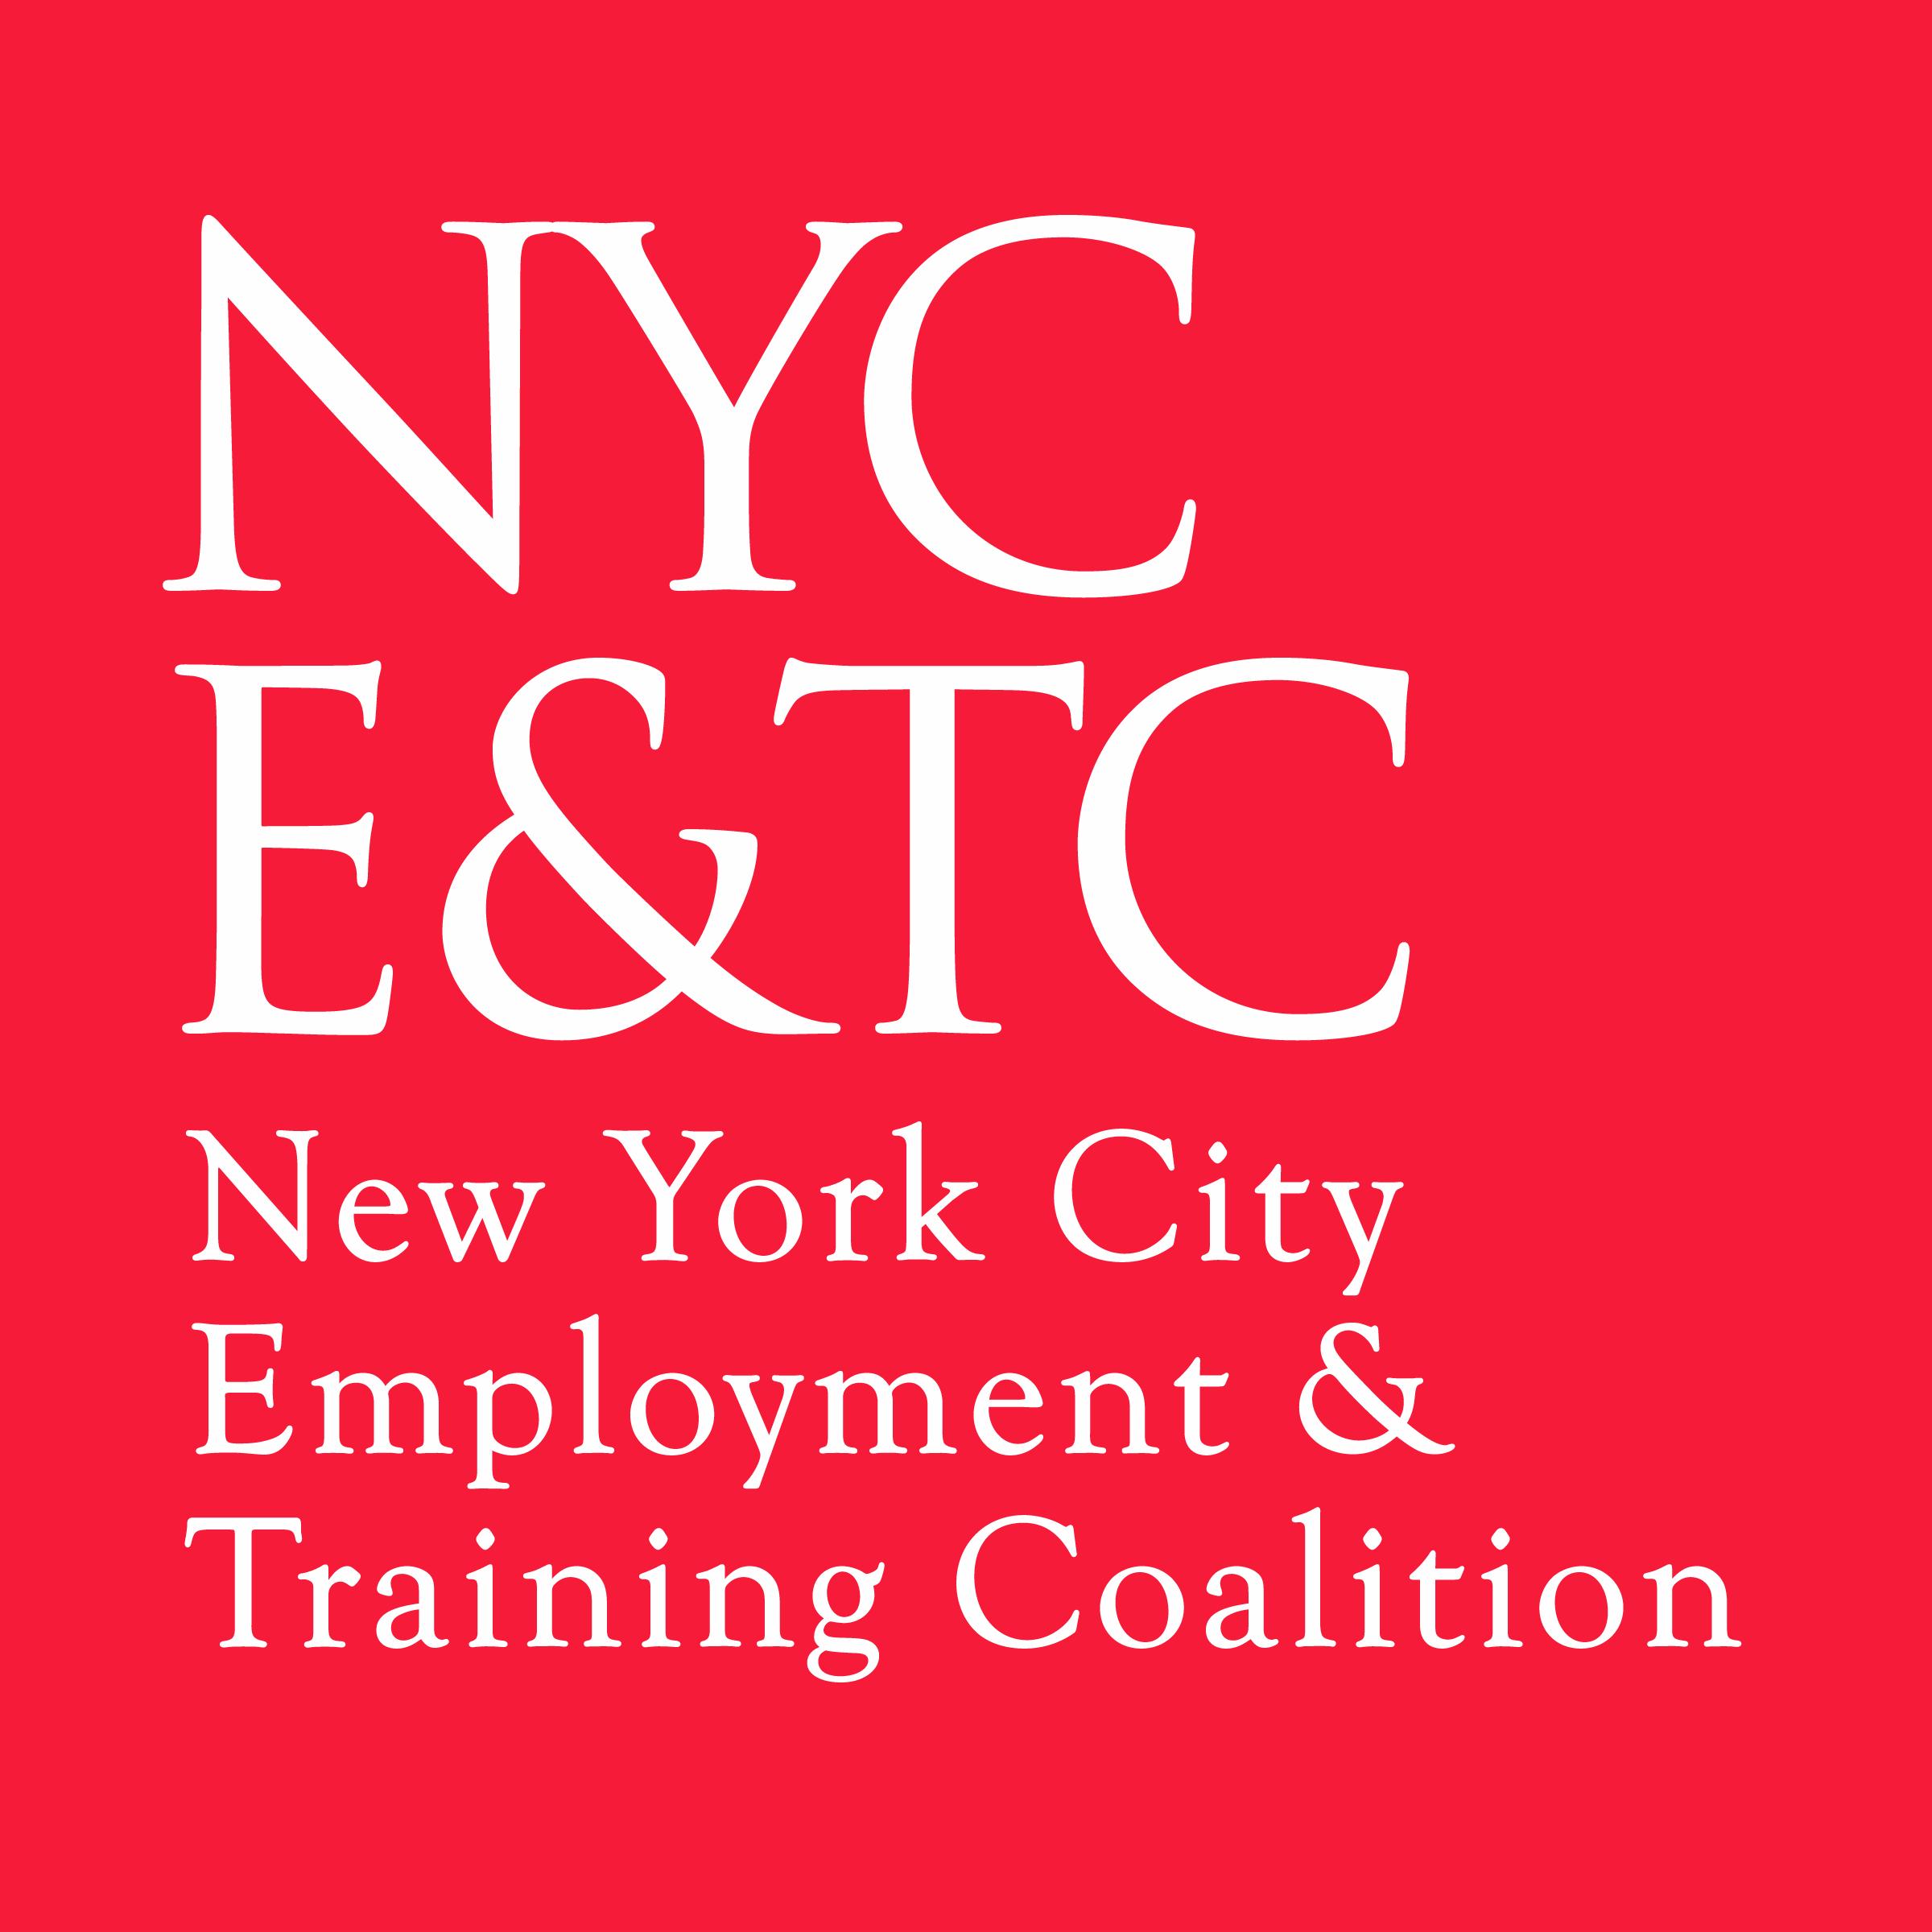 NYCETC Logo.png